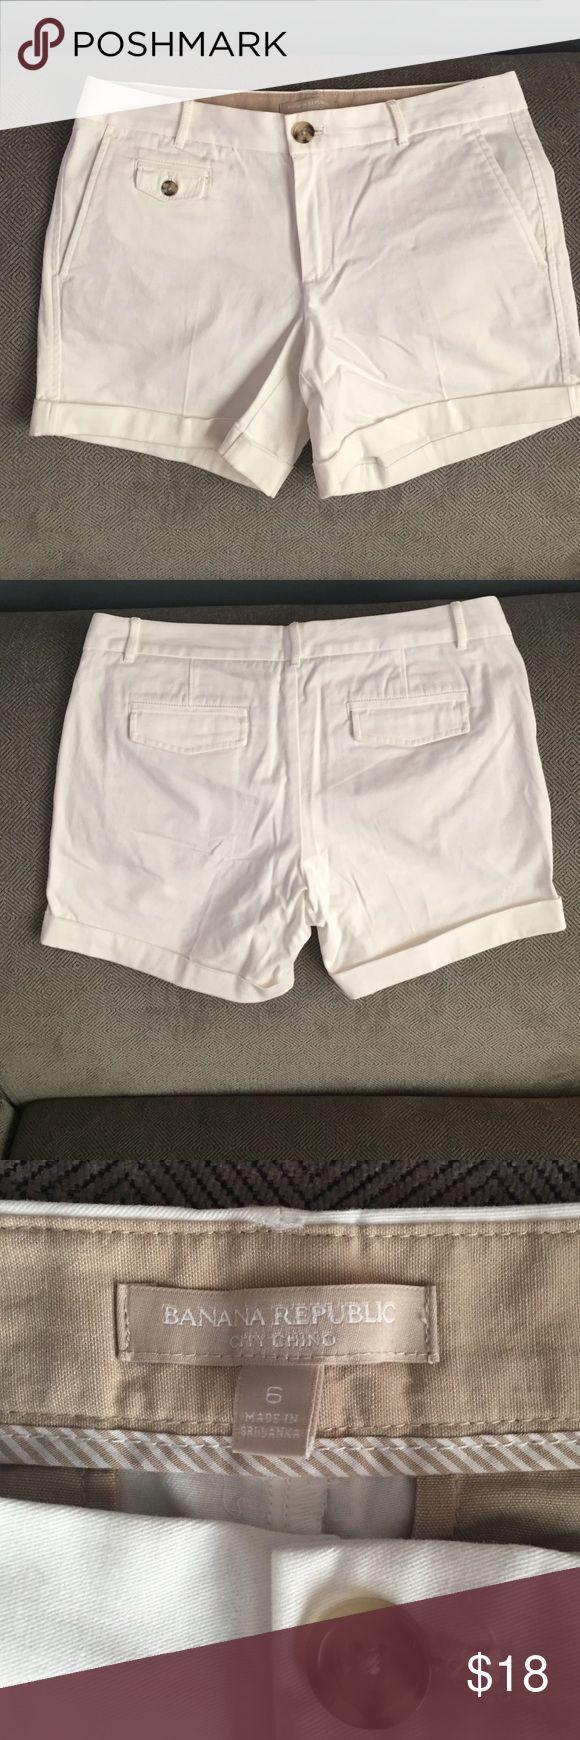 ⚡️⚡️Flash Sale⚡️Banana Republic City Chino Shorts EUC Banana Republic City Chino Shorts. Super cute and versatile. Dress them up or down. Banana Republic Shorts